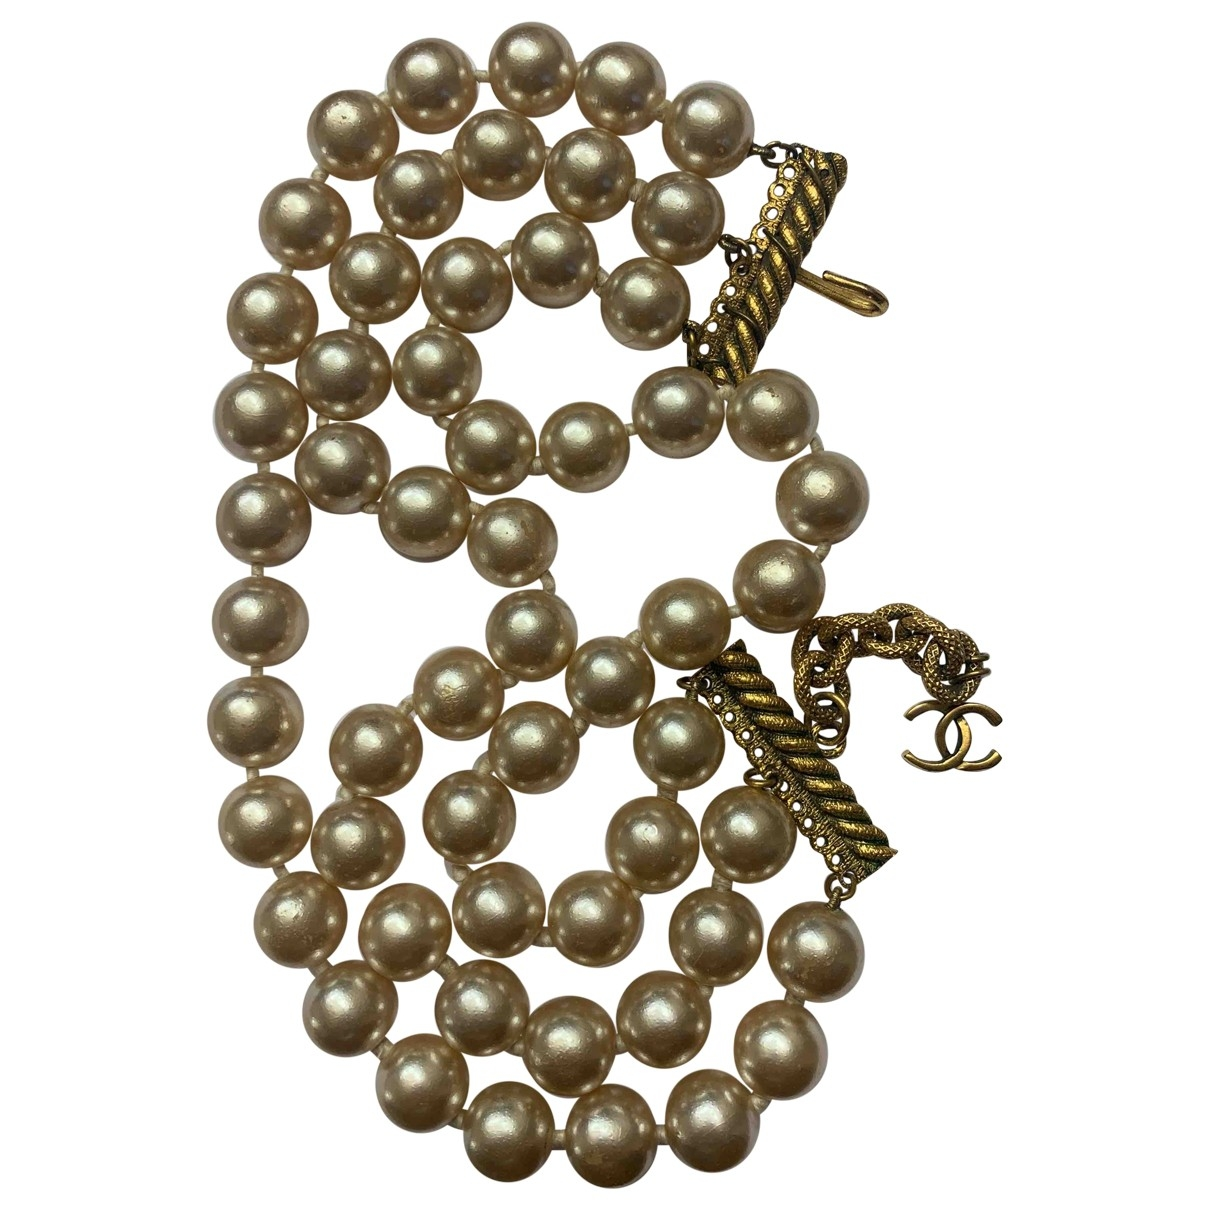 Chanel \N Beige Pearls necklace for Women \N